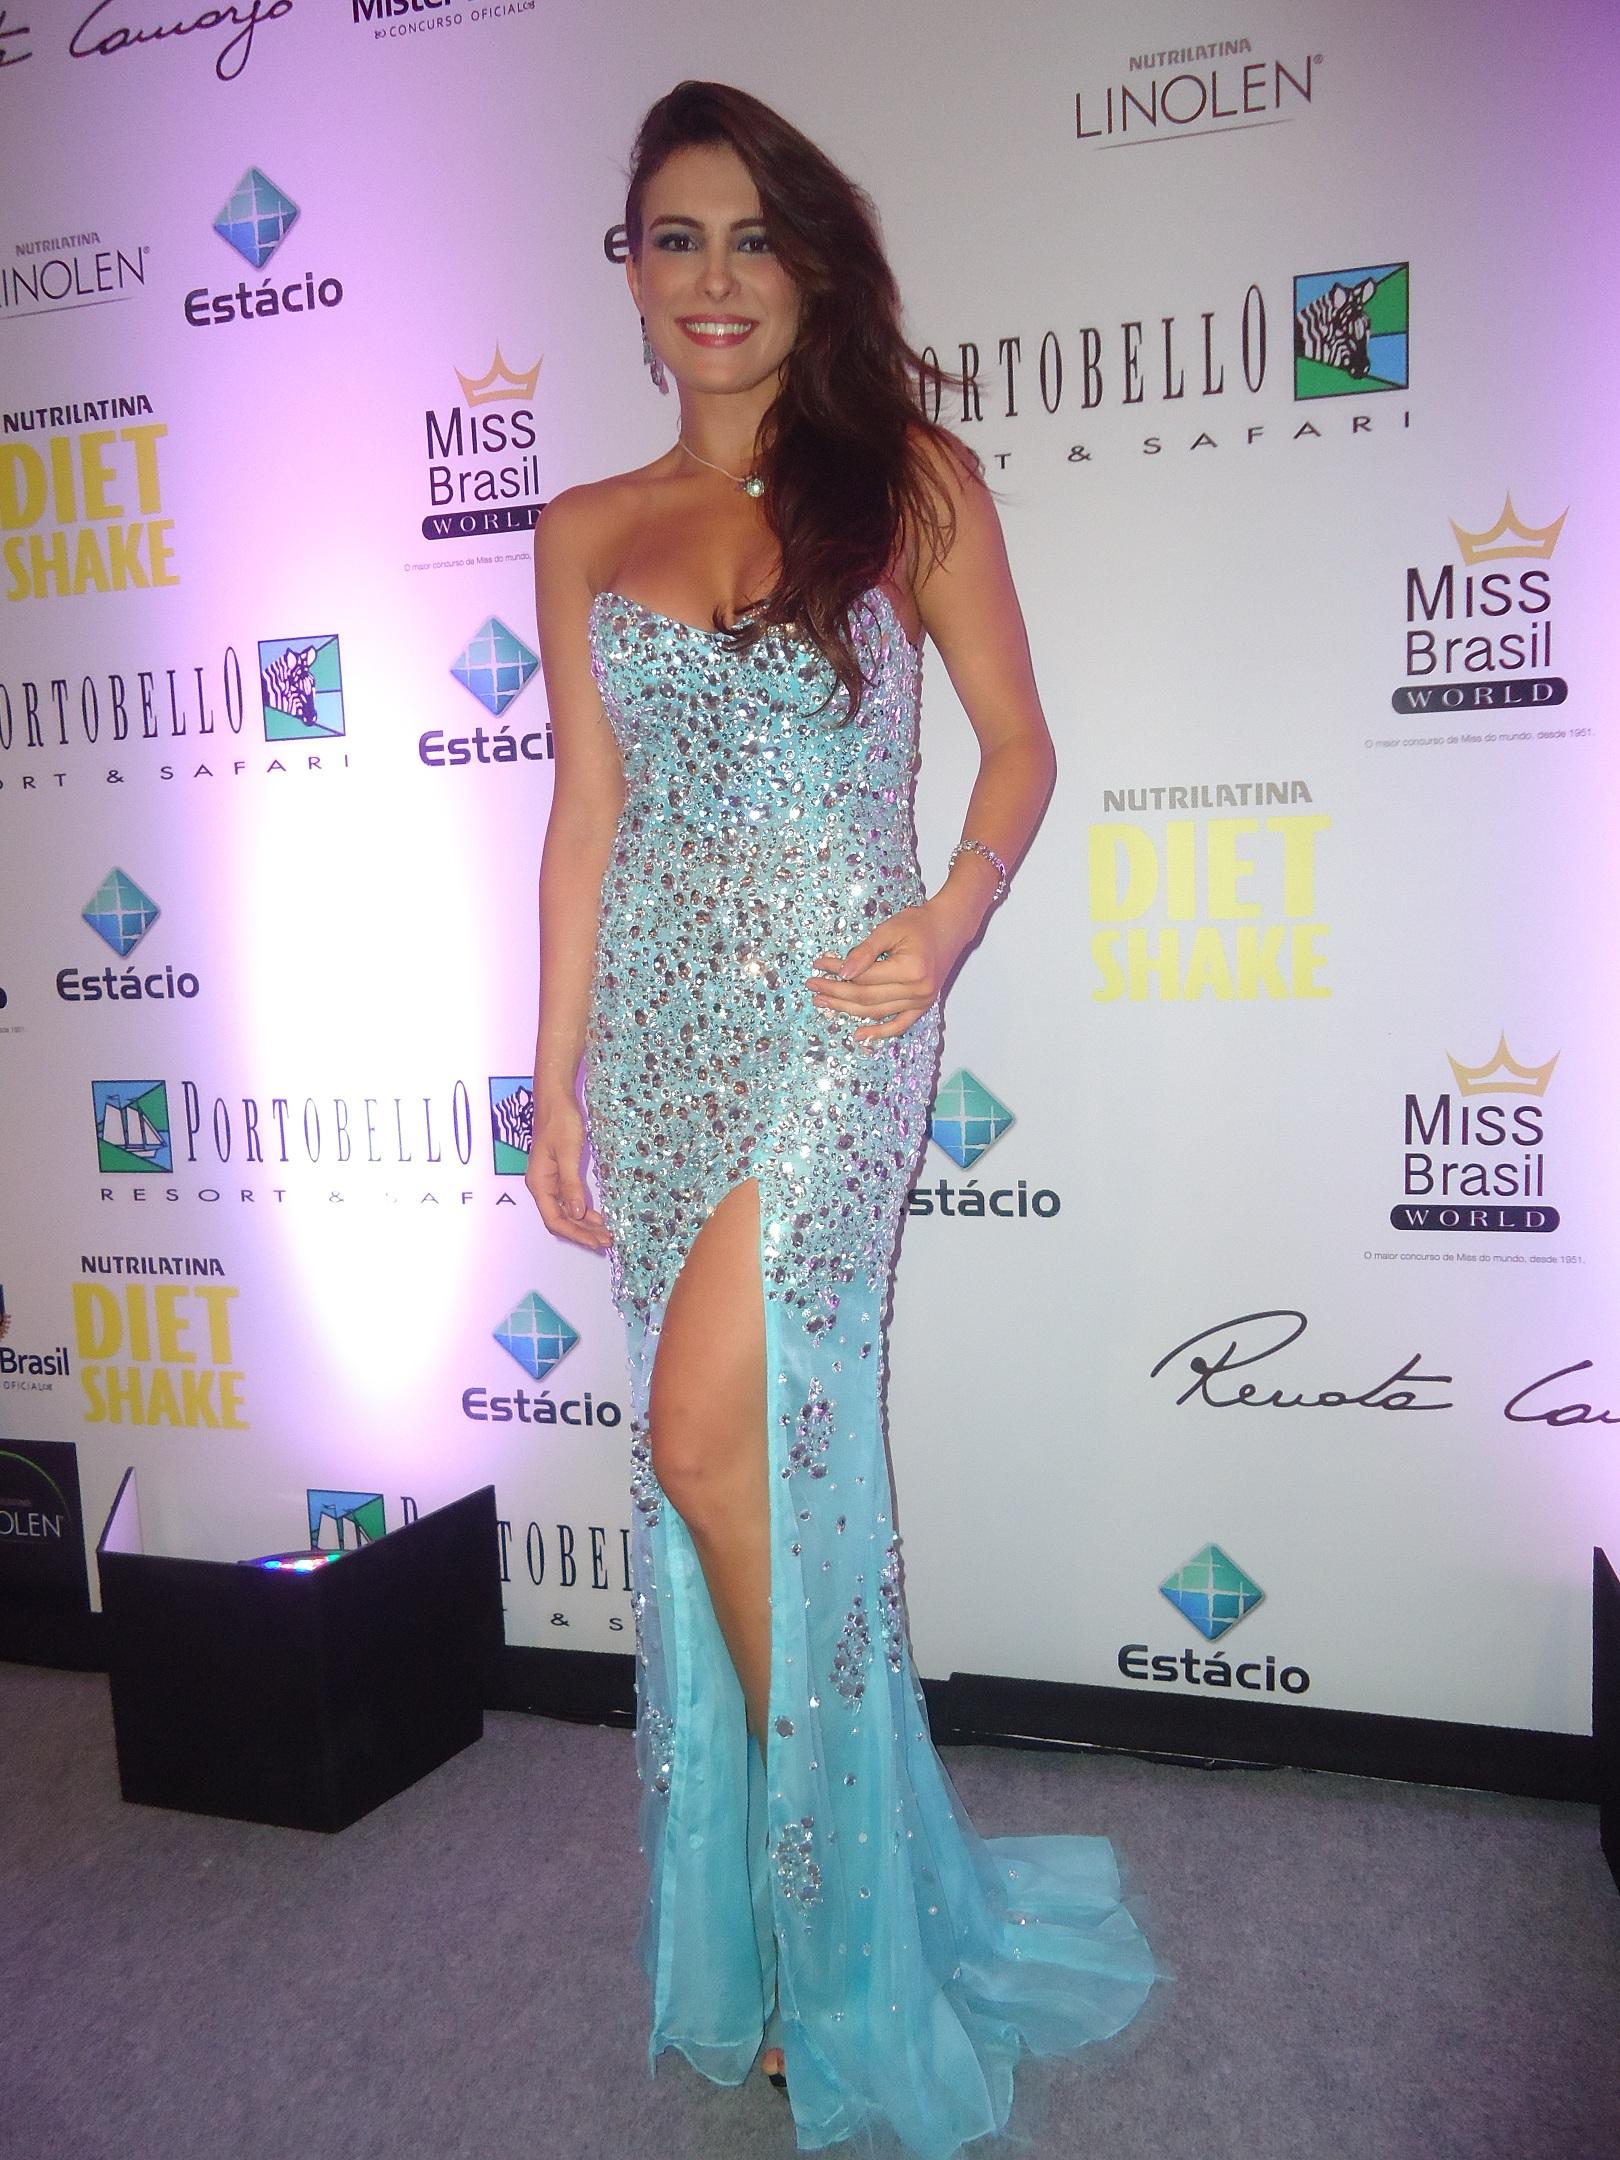 kamilla salgado, miss mundo brasil 2010. Fmu8aay6